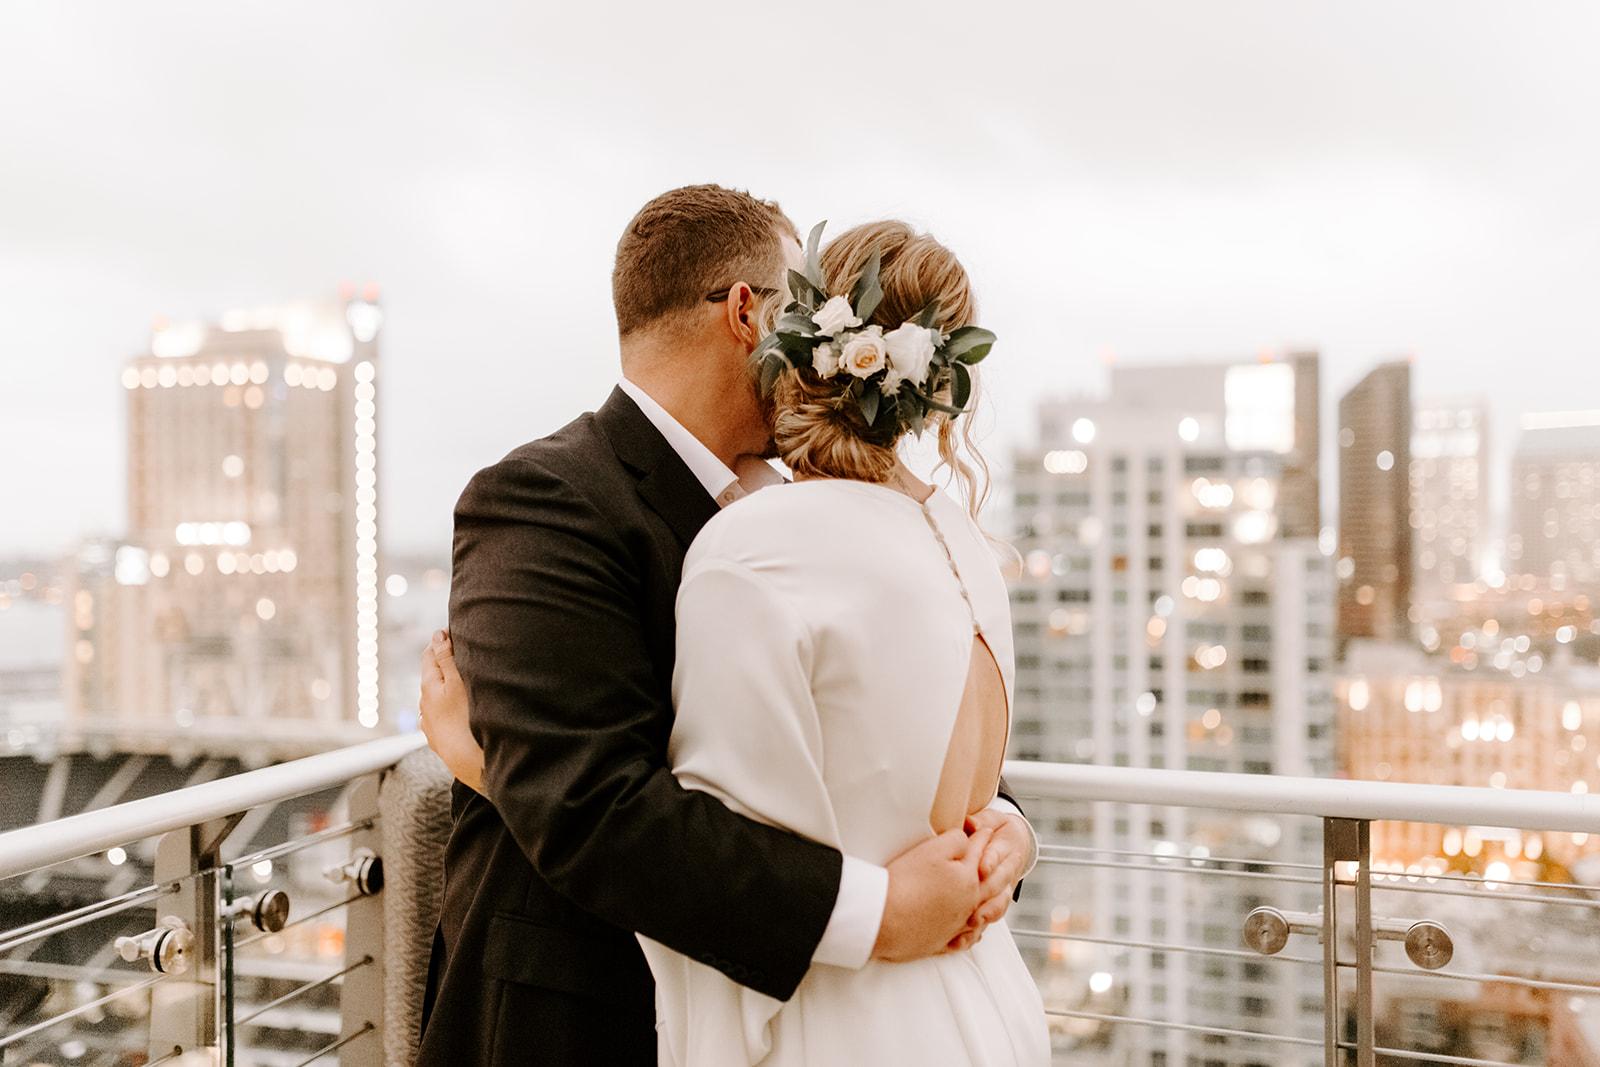 Mckenzie + Trevor The Ultimate Skybox Downtown San Diego Wedding Ellie Cole Photographer-700.jpg